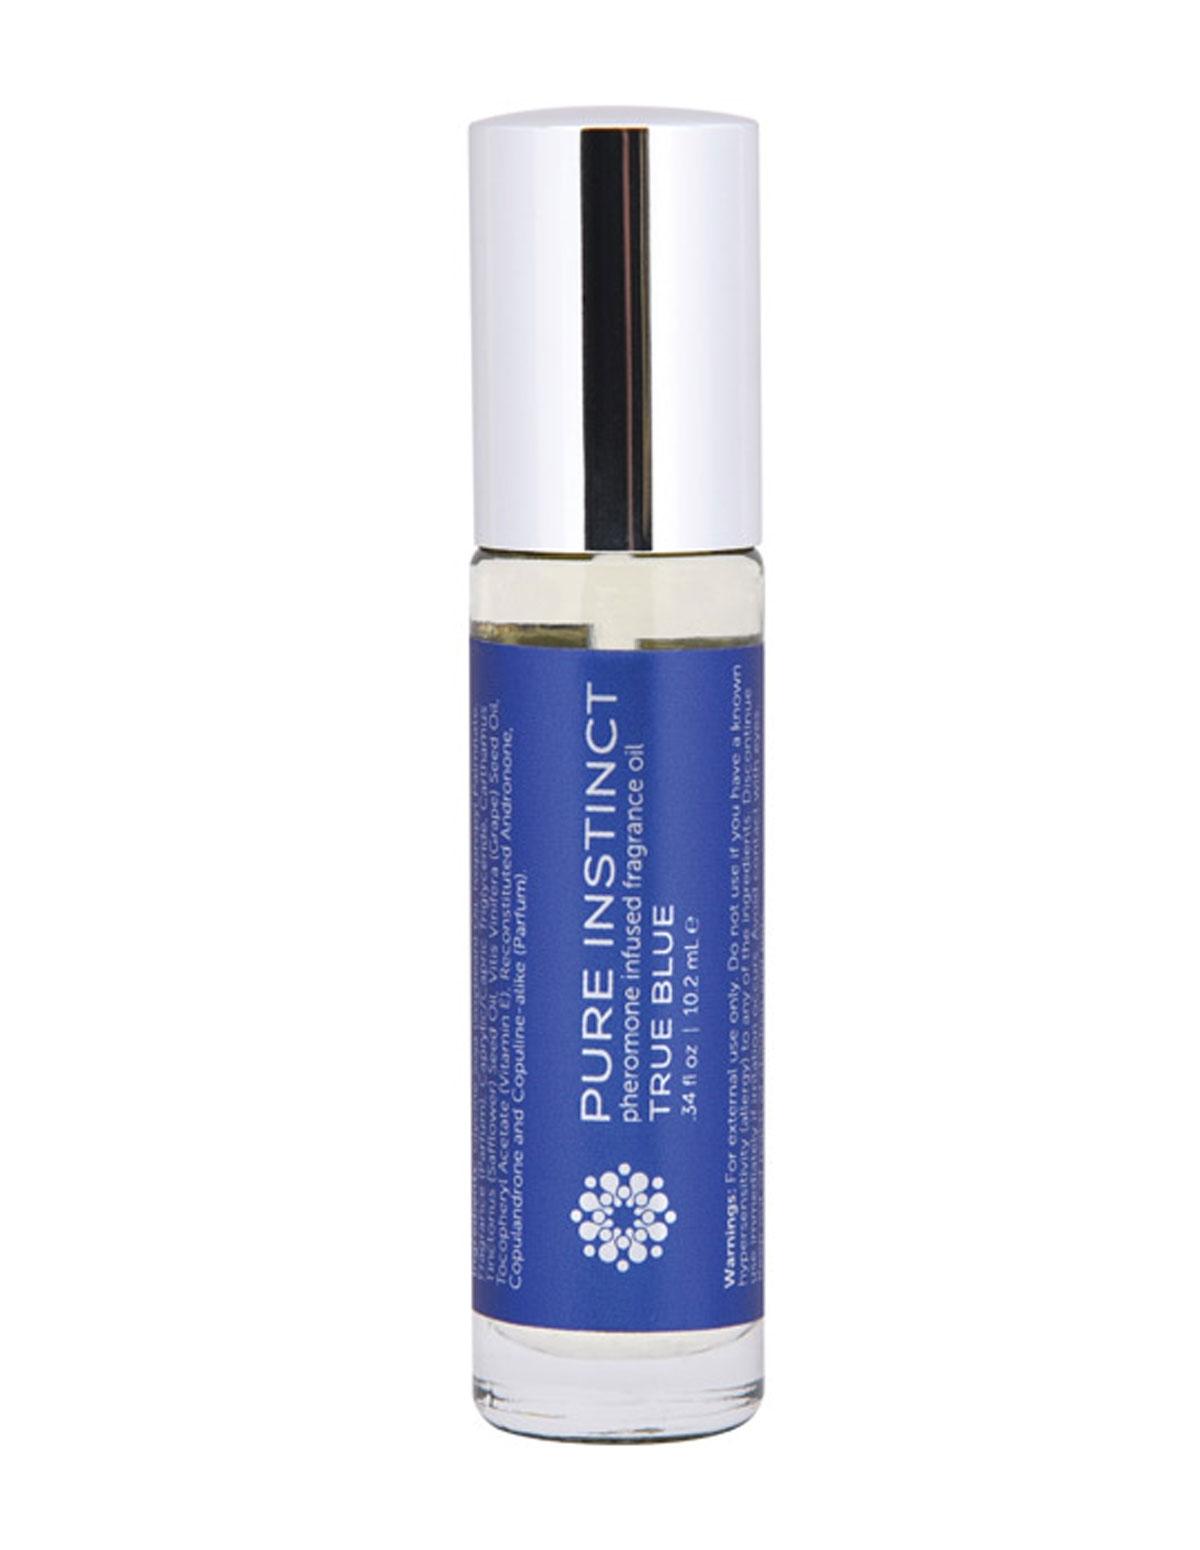 Pure Instinct True Blue Roll On Pheromone Unisex